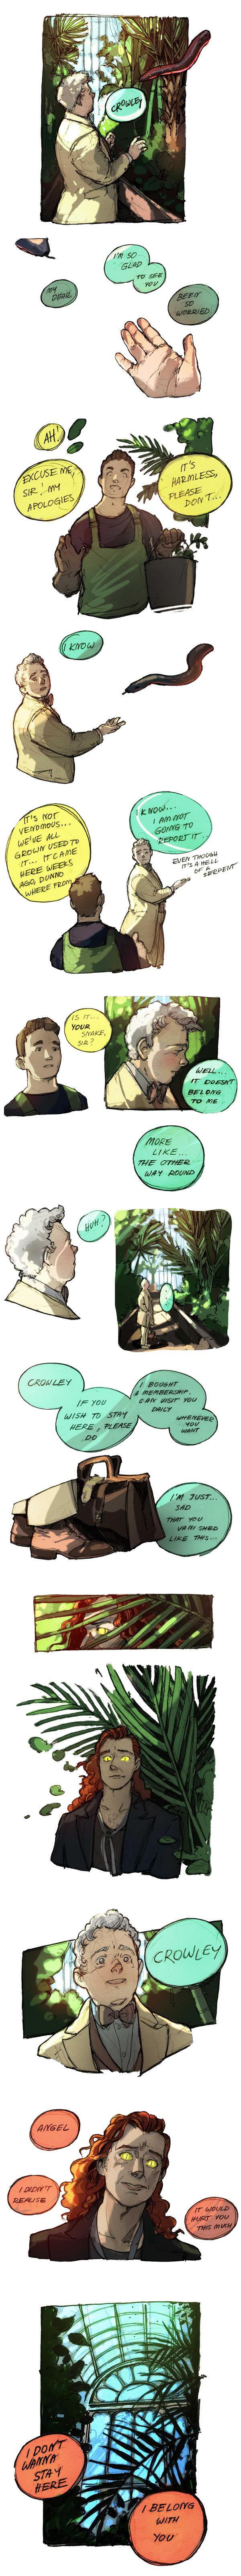 Aziraphale + Crowley on goodomens - DeviantArt